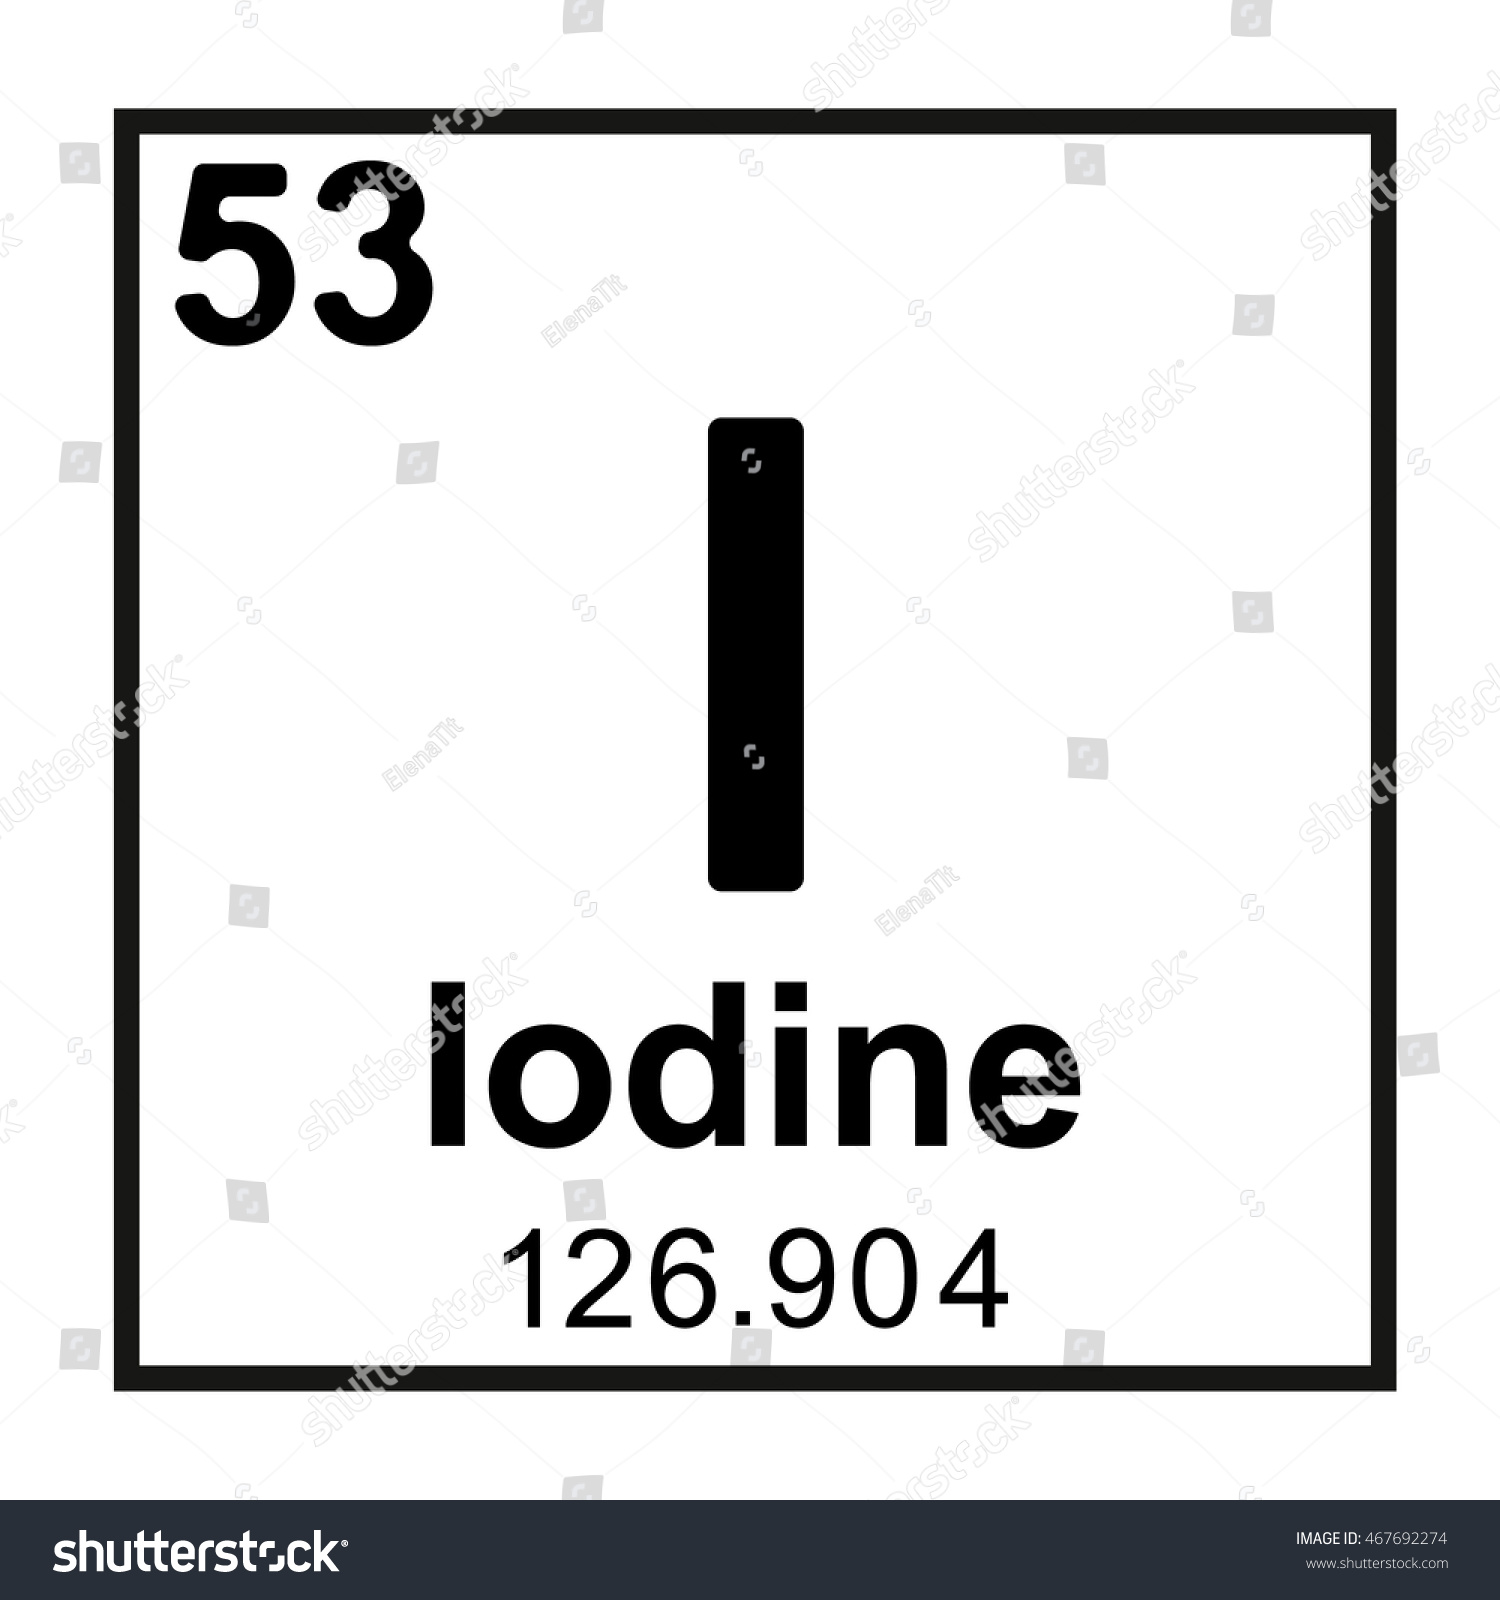 Periodic table element iodine stock vector 467692274 shutterstock periodic table element iodine gamestrikefo Gallery